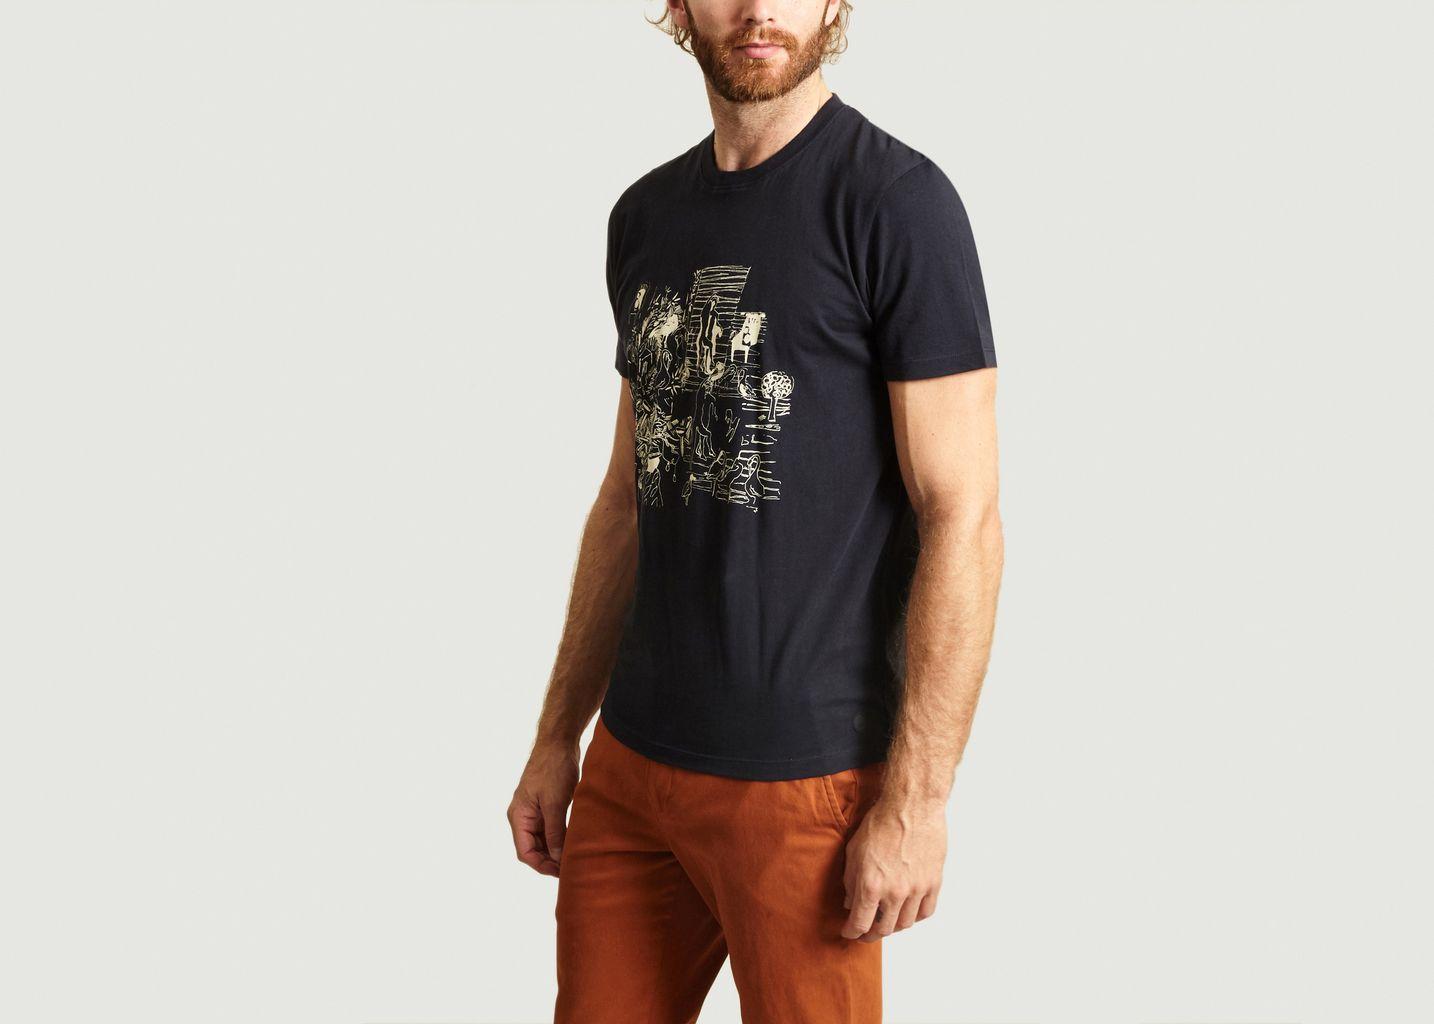 T-shirt Imprimé Folk x Goss Brothers - Folk